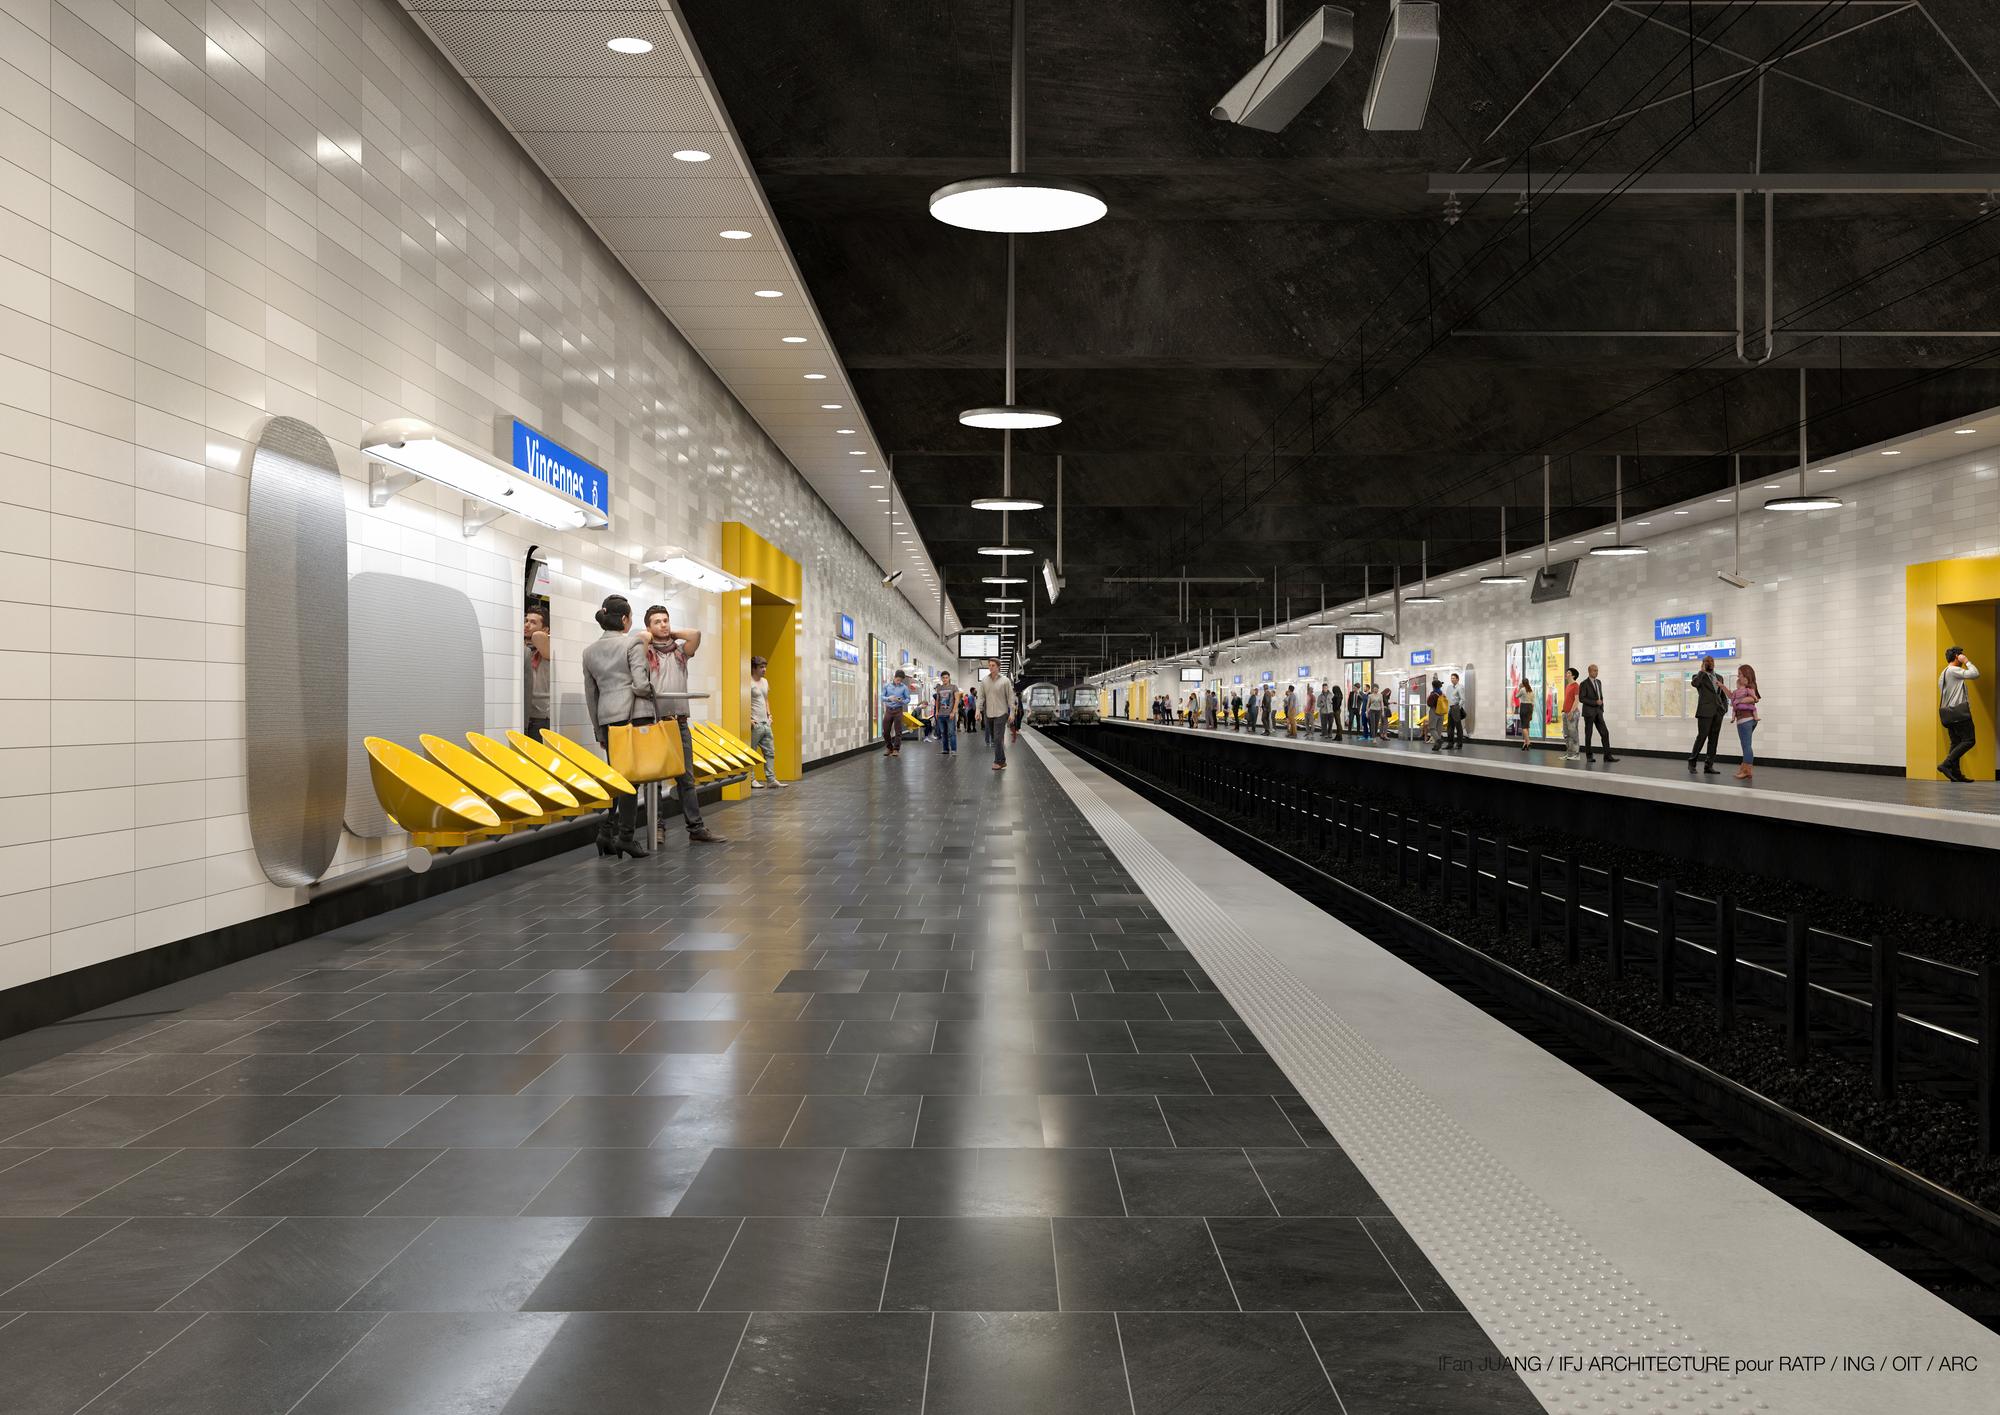 https://i.ibb.co/59ppYjy/TLDR-IFJA-RATP-VINC-QUAIV2-VUE1-170930.jpg